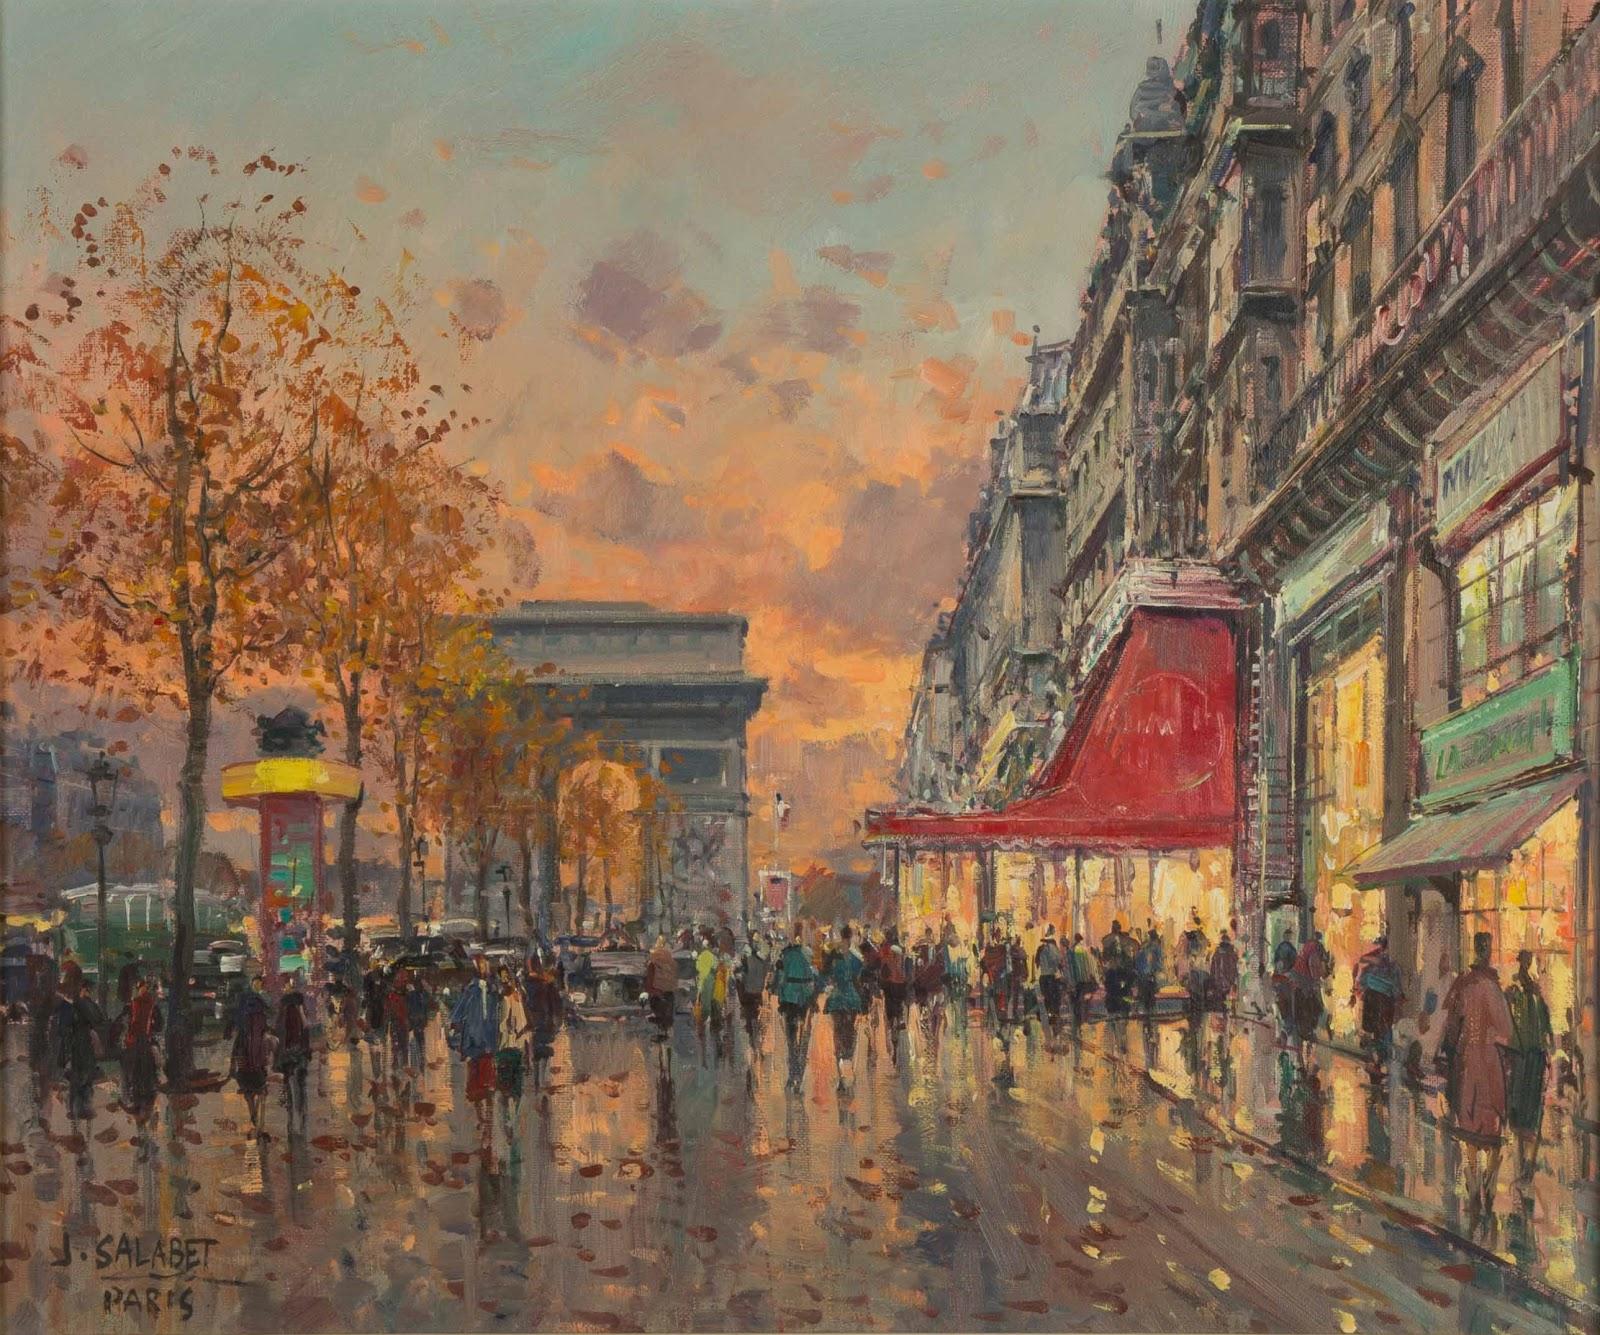 Jean Salabet Paris Paris Street Scene